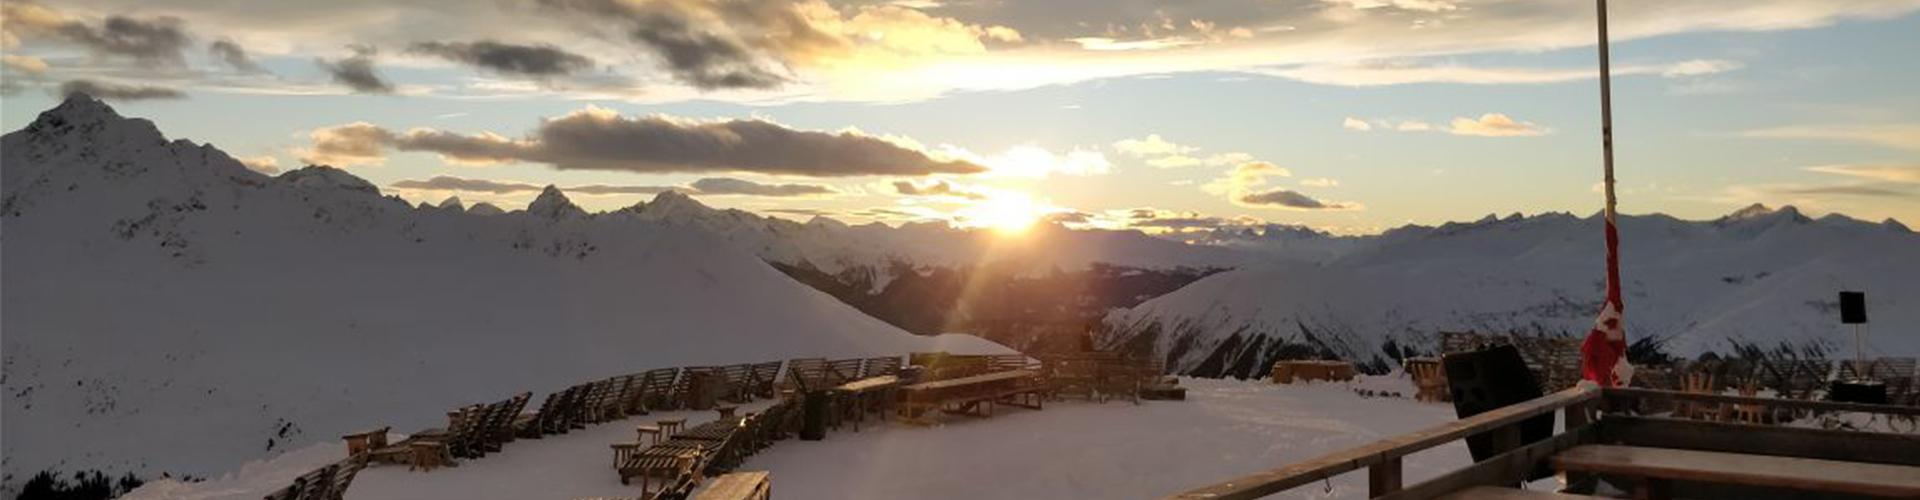 Ski- /Snowboardfreizeit Davos 2019